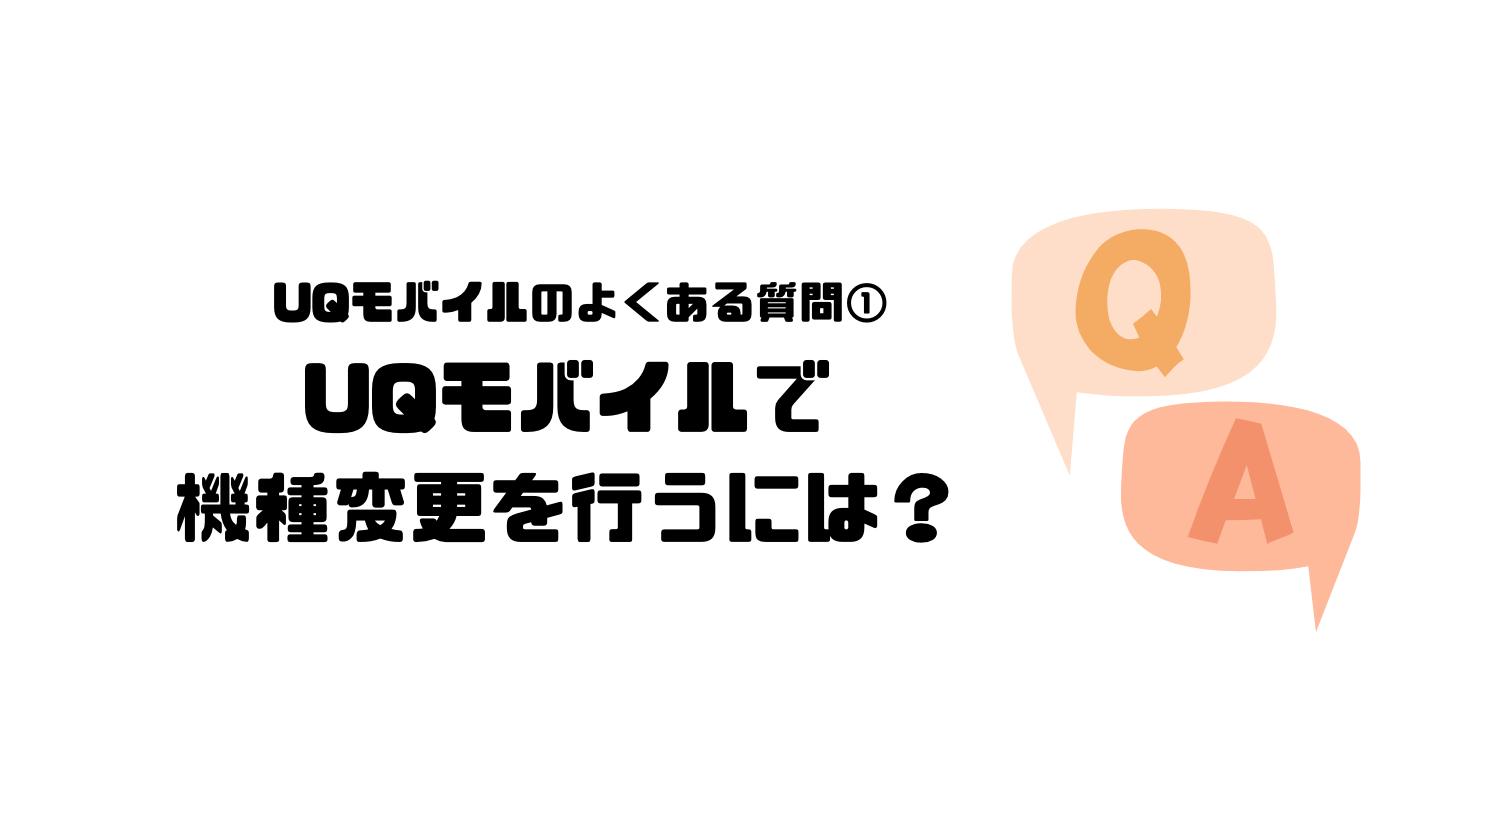 UQモバイル_口コミ_よくある質問_機種変更_方法